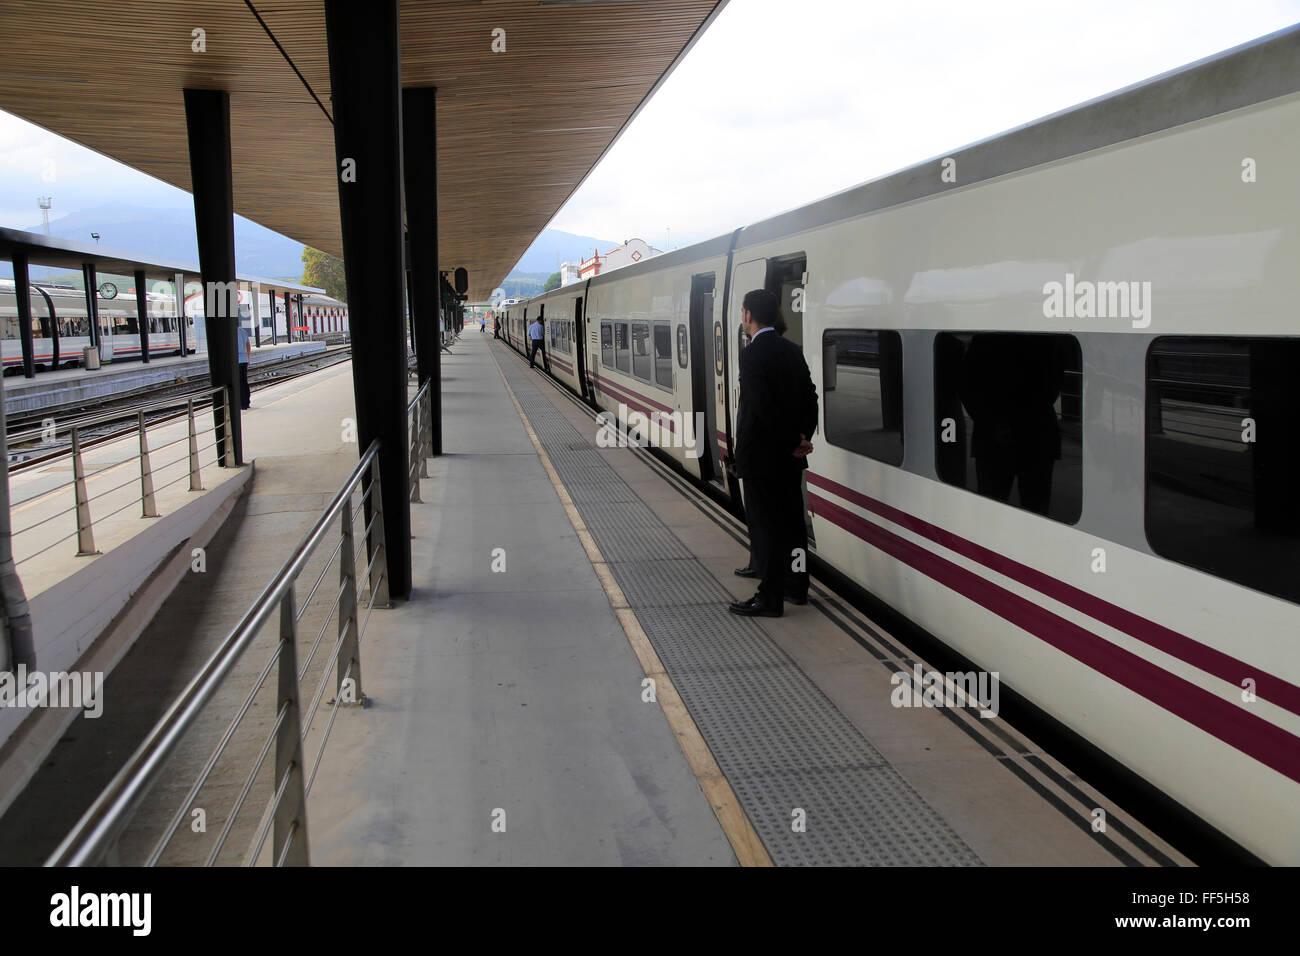 Train awaiting departure on platform at railway station, Algeciras, Cadiz province, Spain - Stock Image